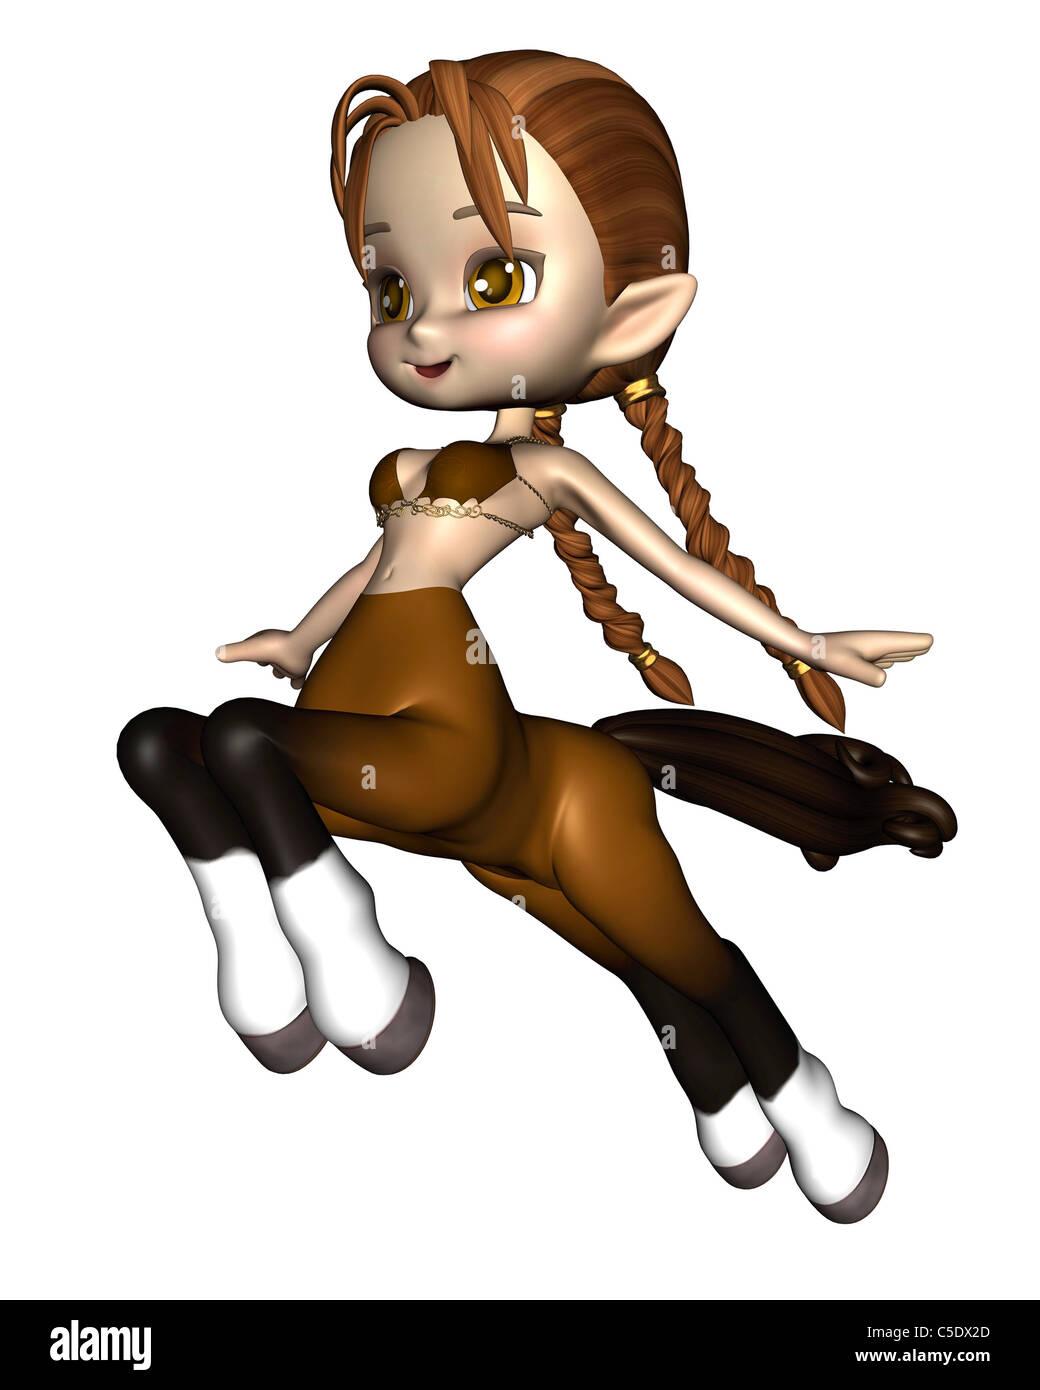 Cute Toon Female Centaur - Brown - Stock Image